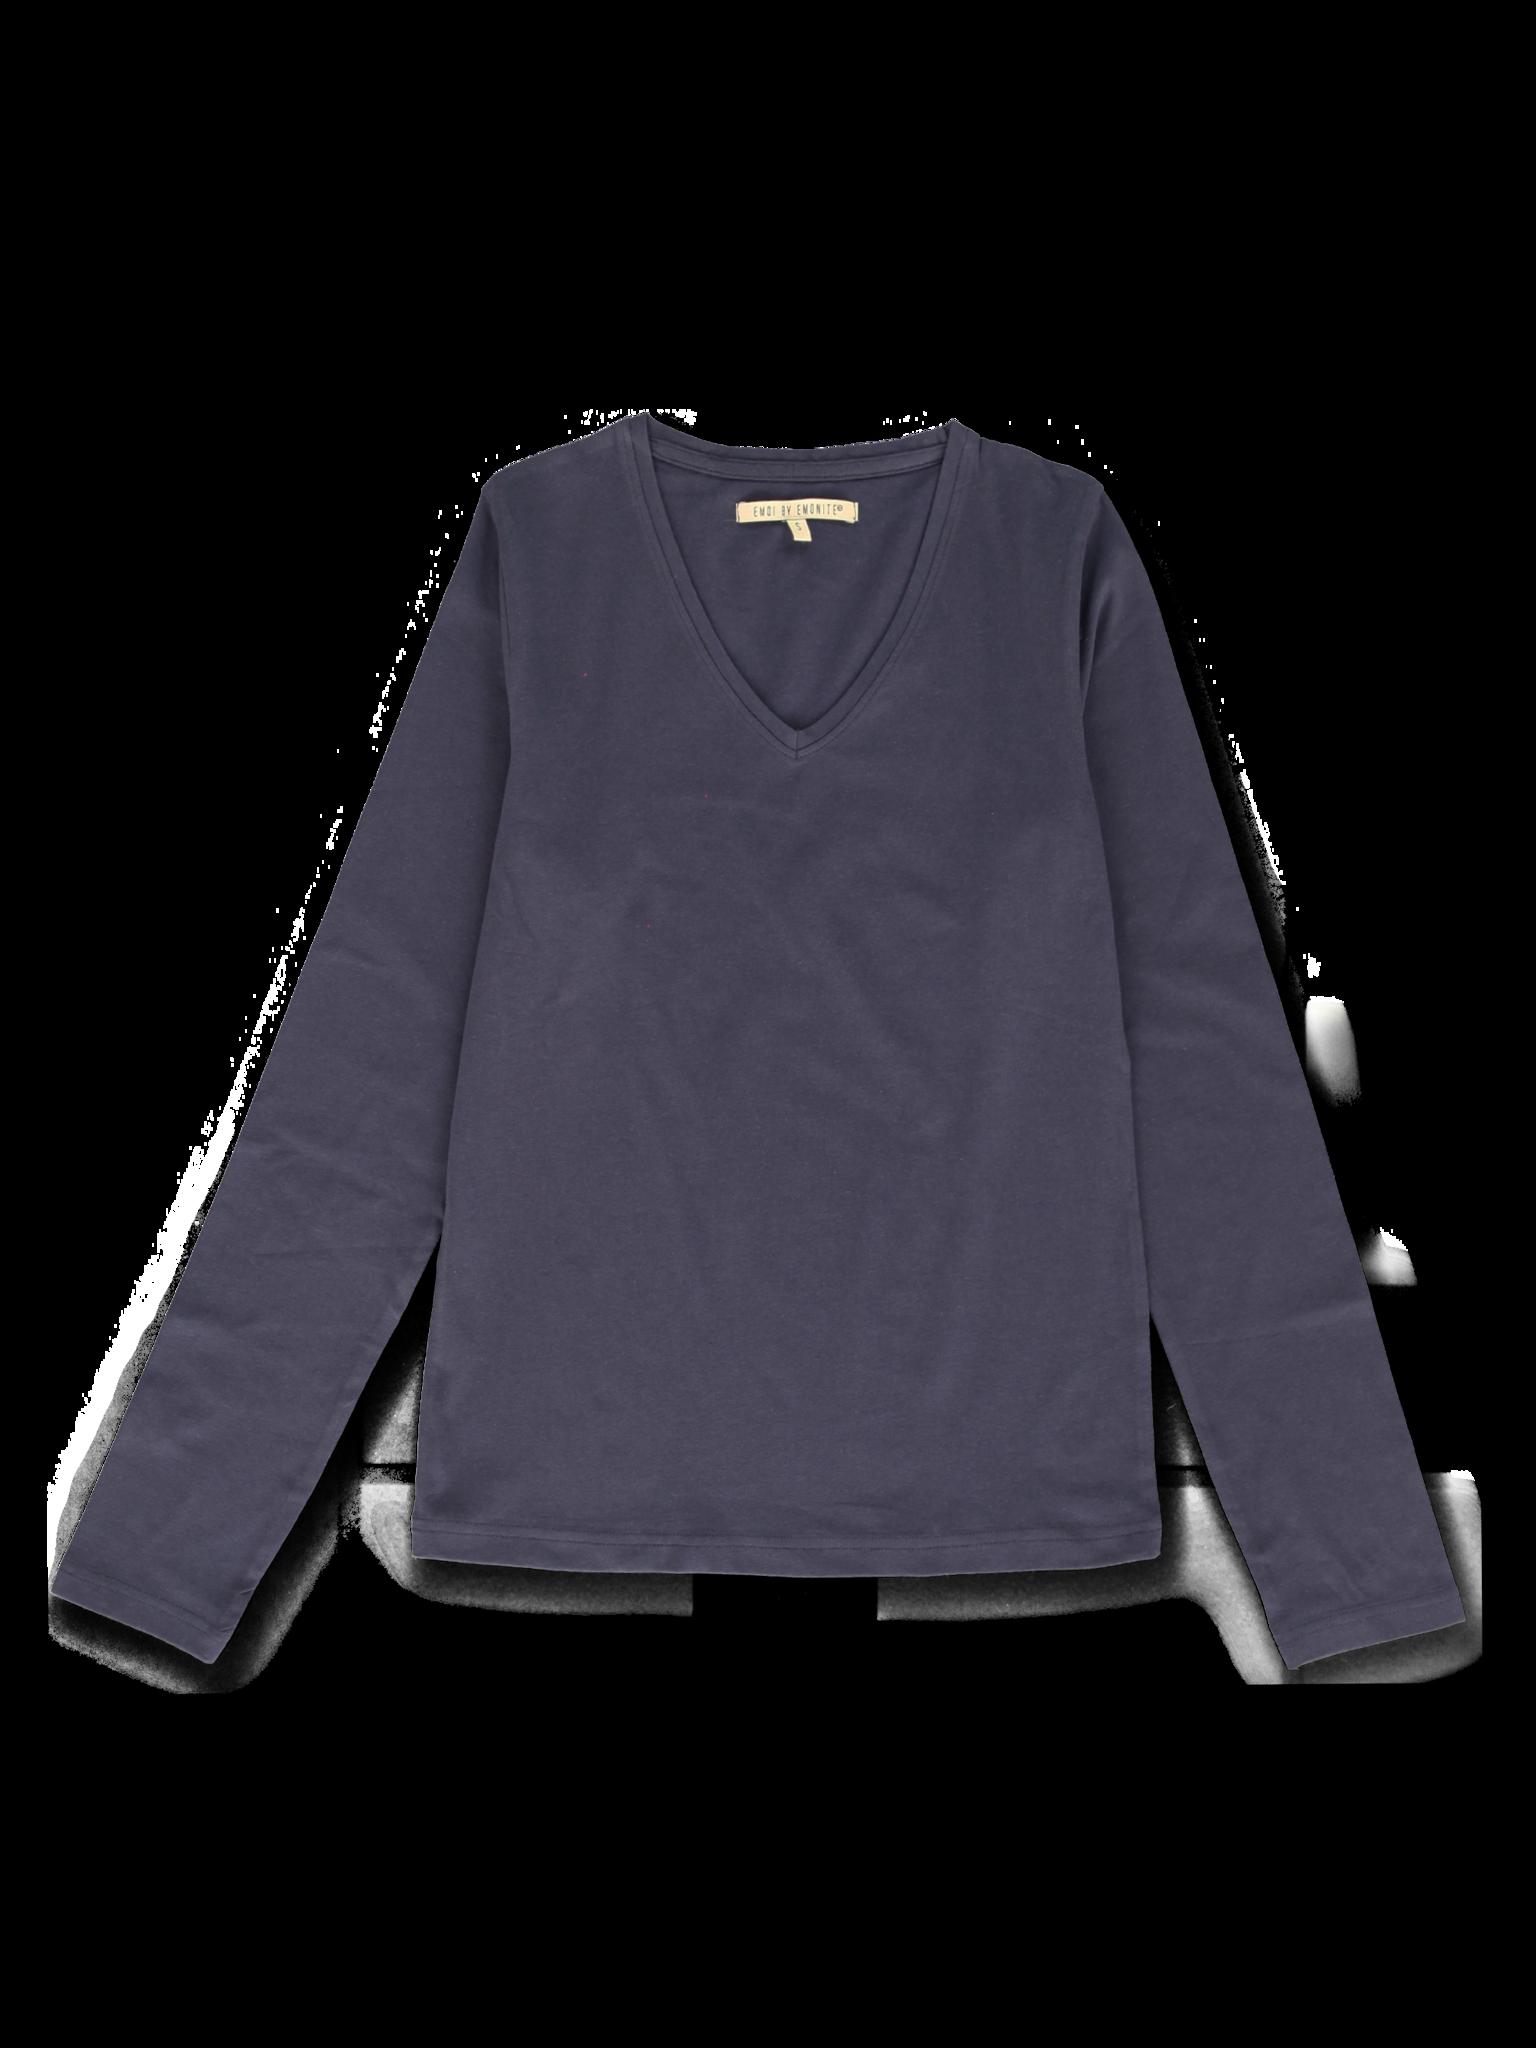 All Brands | Winterproducts Ladies | T-shirt | 40 pcs/box